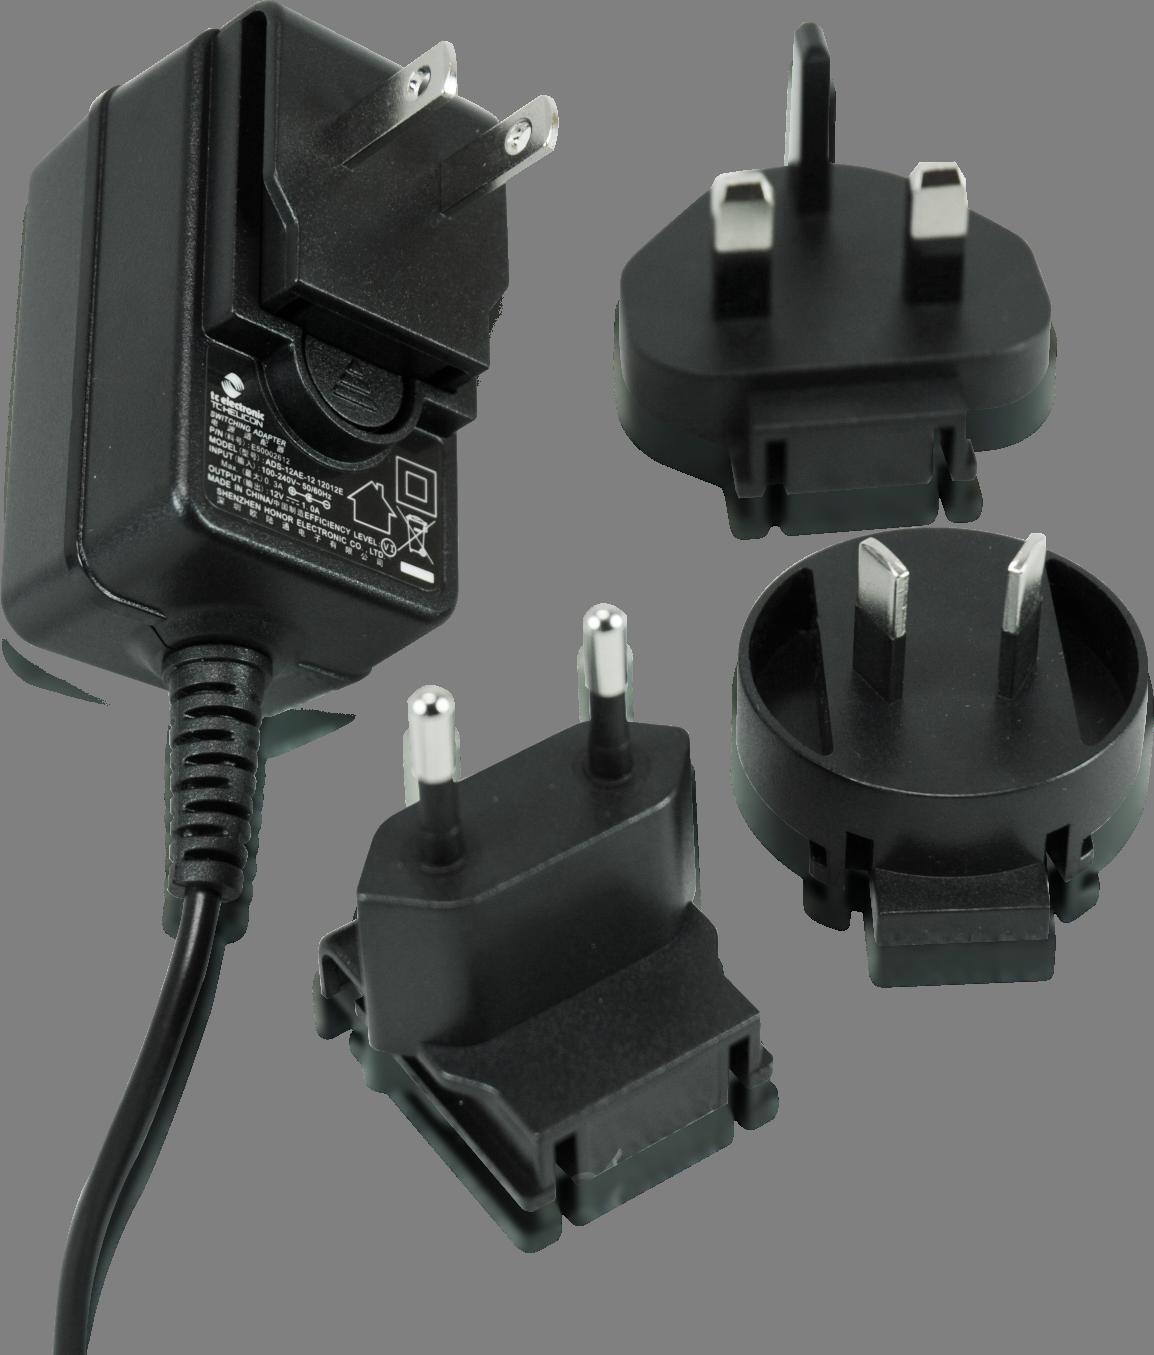 TC Helicon POWERPLUG 12 - Power supply